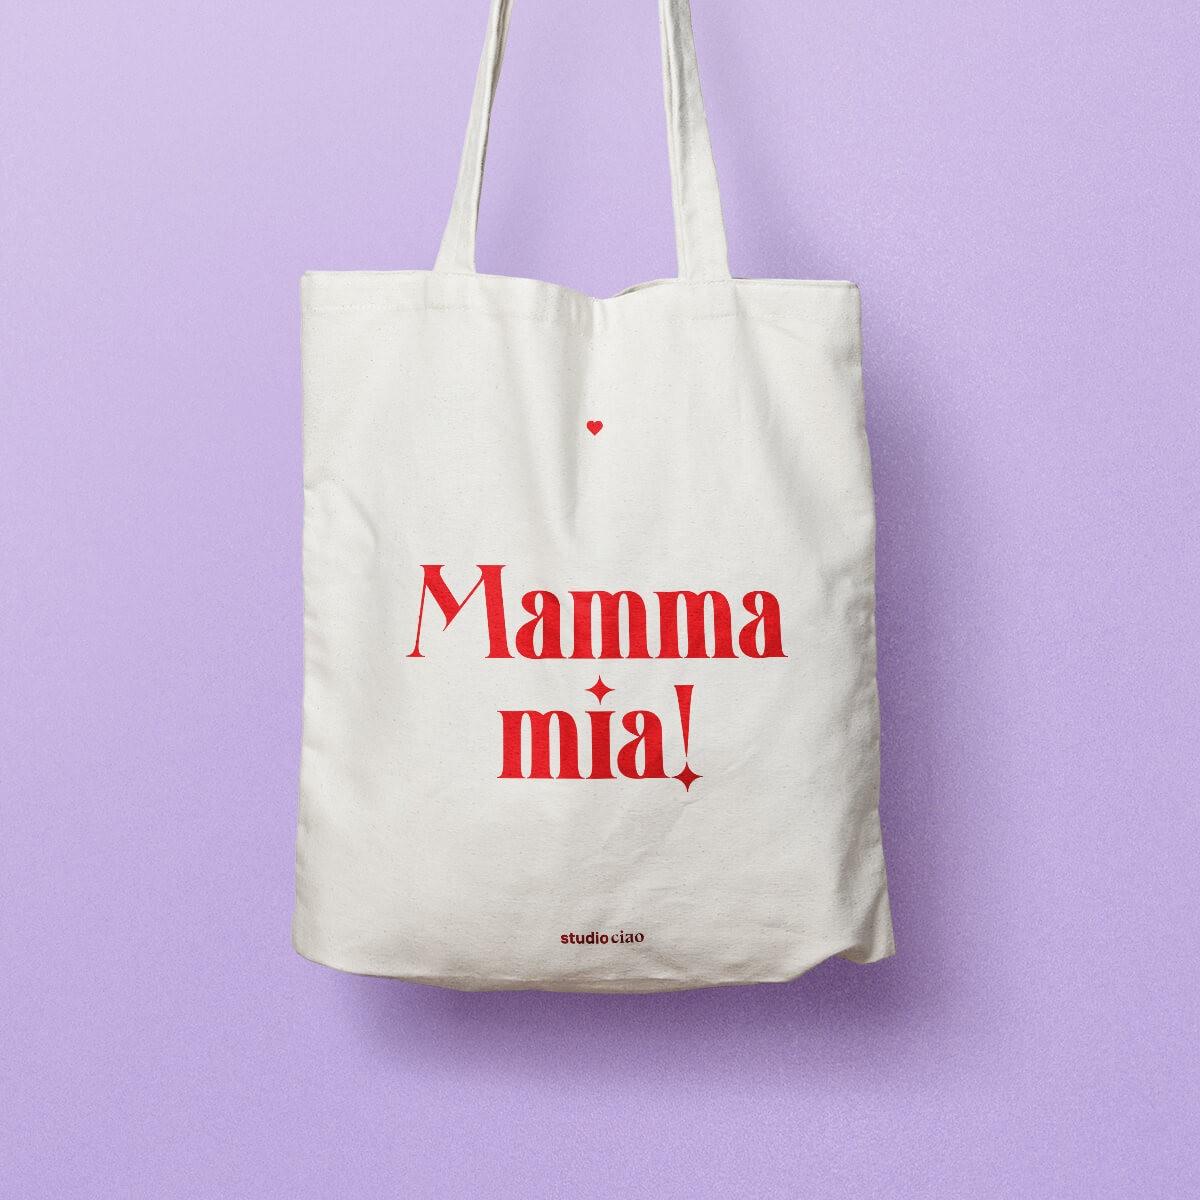 Mamma Mia Jutebeutel (limitierte Auflage) – studio ciao